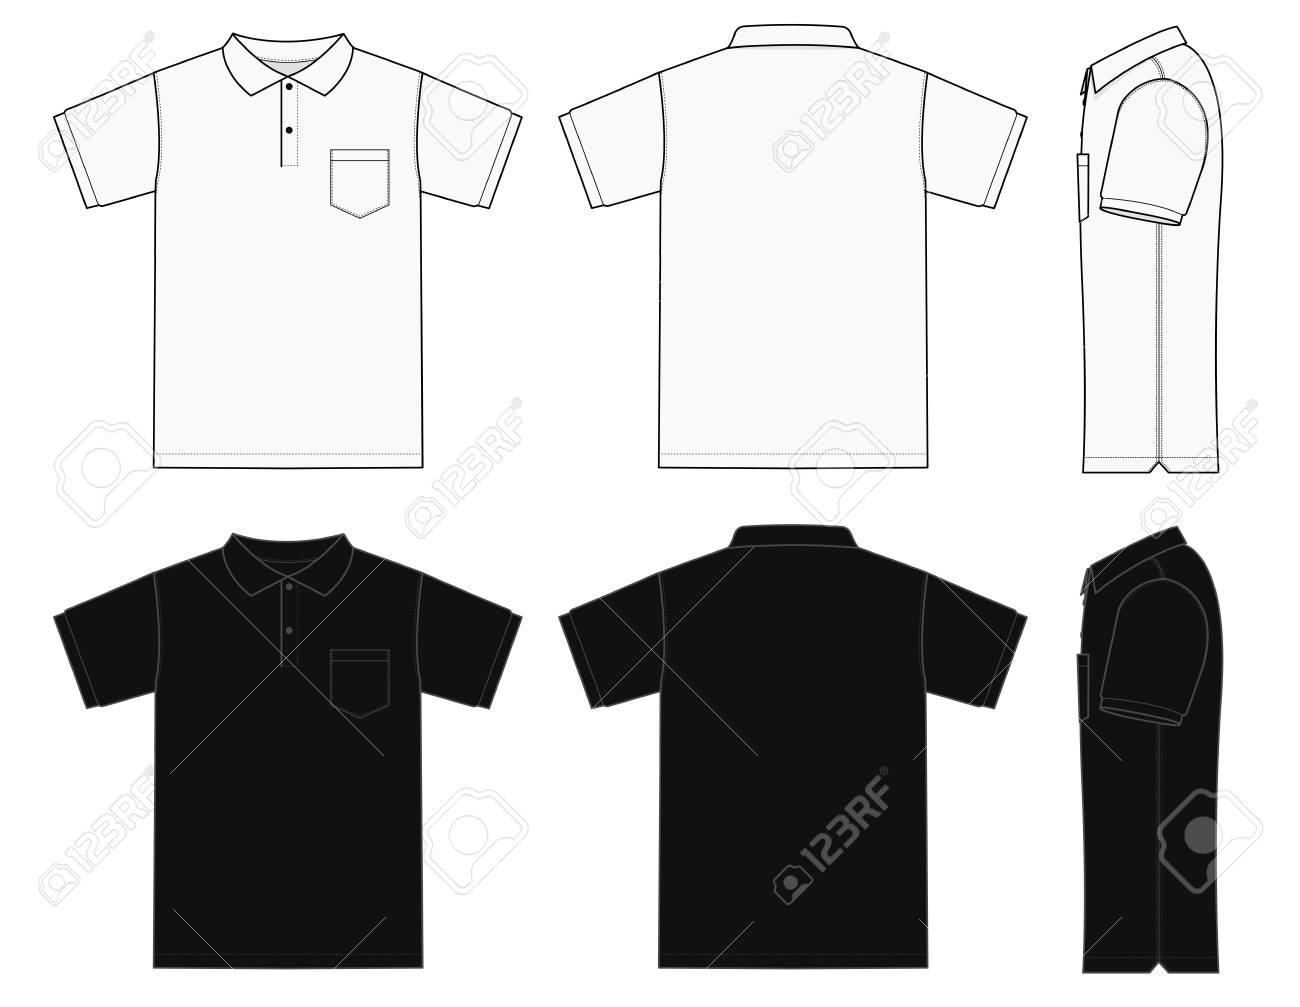 Polo Shirt (golf shirt) template Illustration (front/back/side) - 123848809